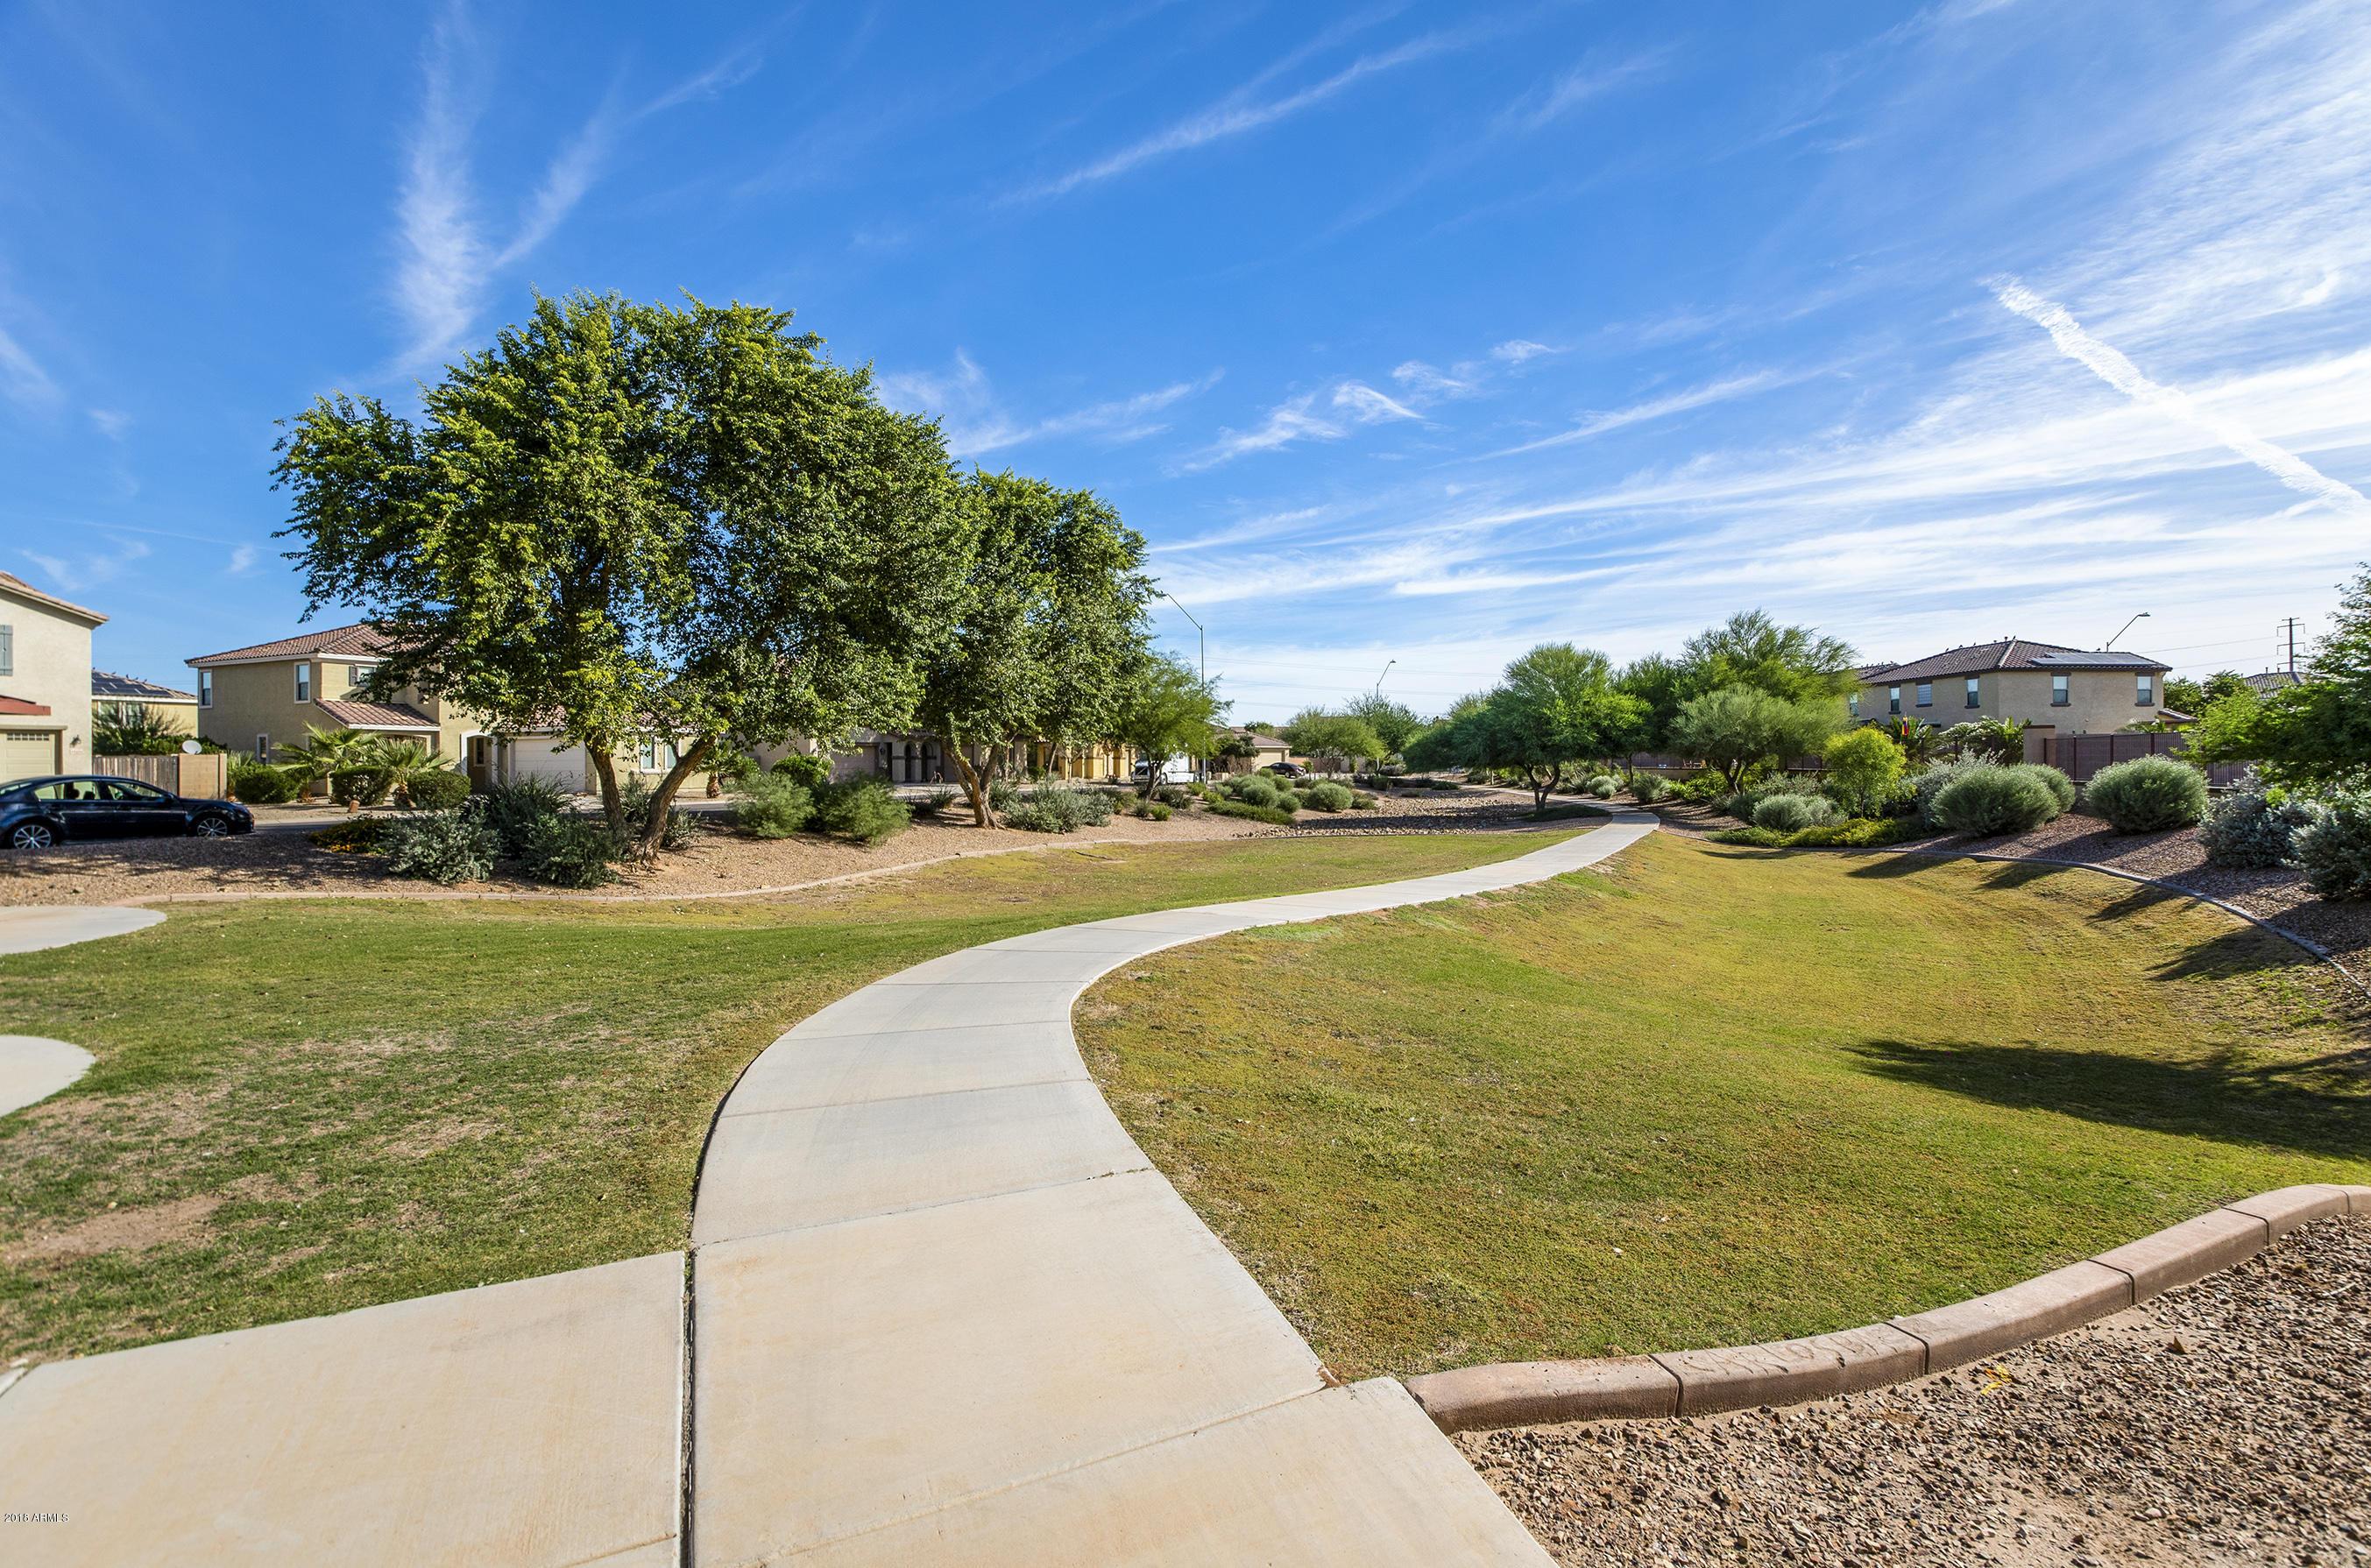 MLS 5841741 40404 W DENNIS Lane, Maricopa, AZ 85138 Maricopa AZ Desert Passage